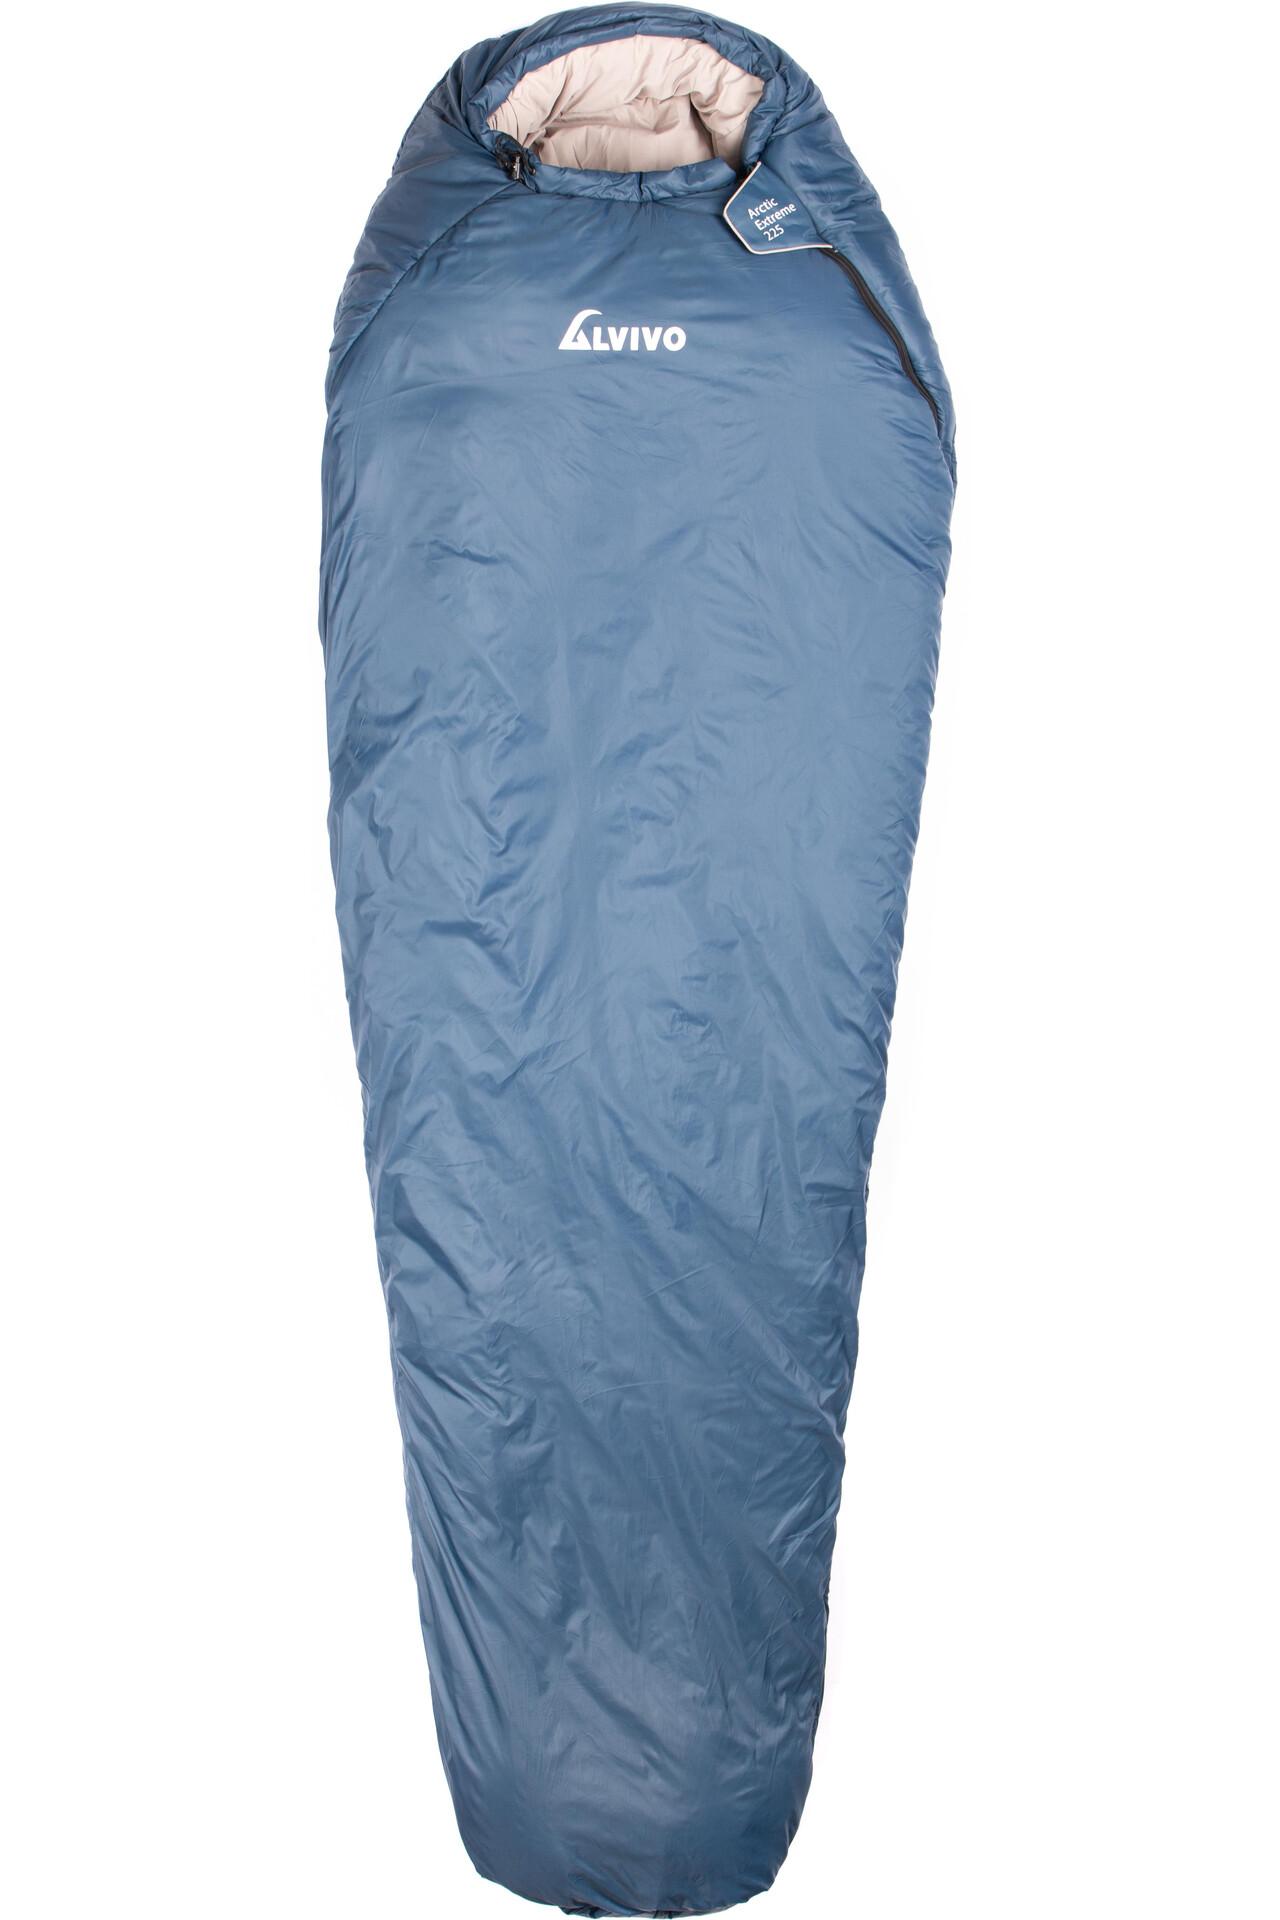 Alvivo Ibex light Duvet Sac de couchage bleu